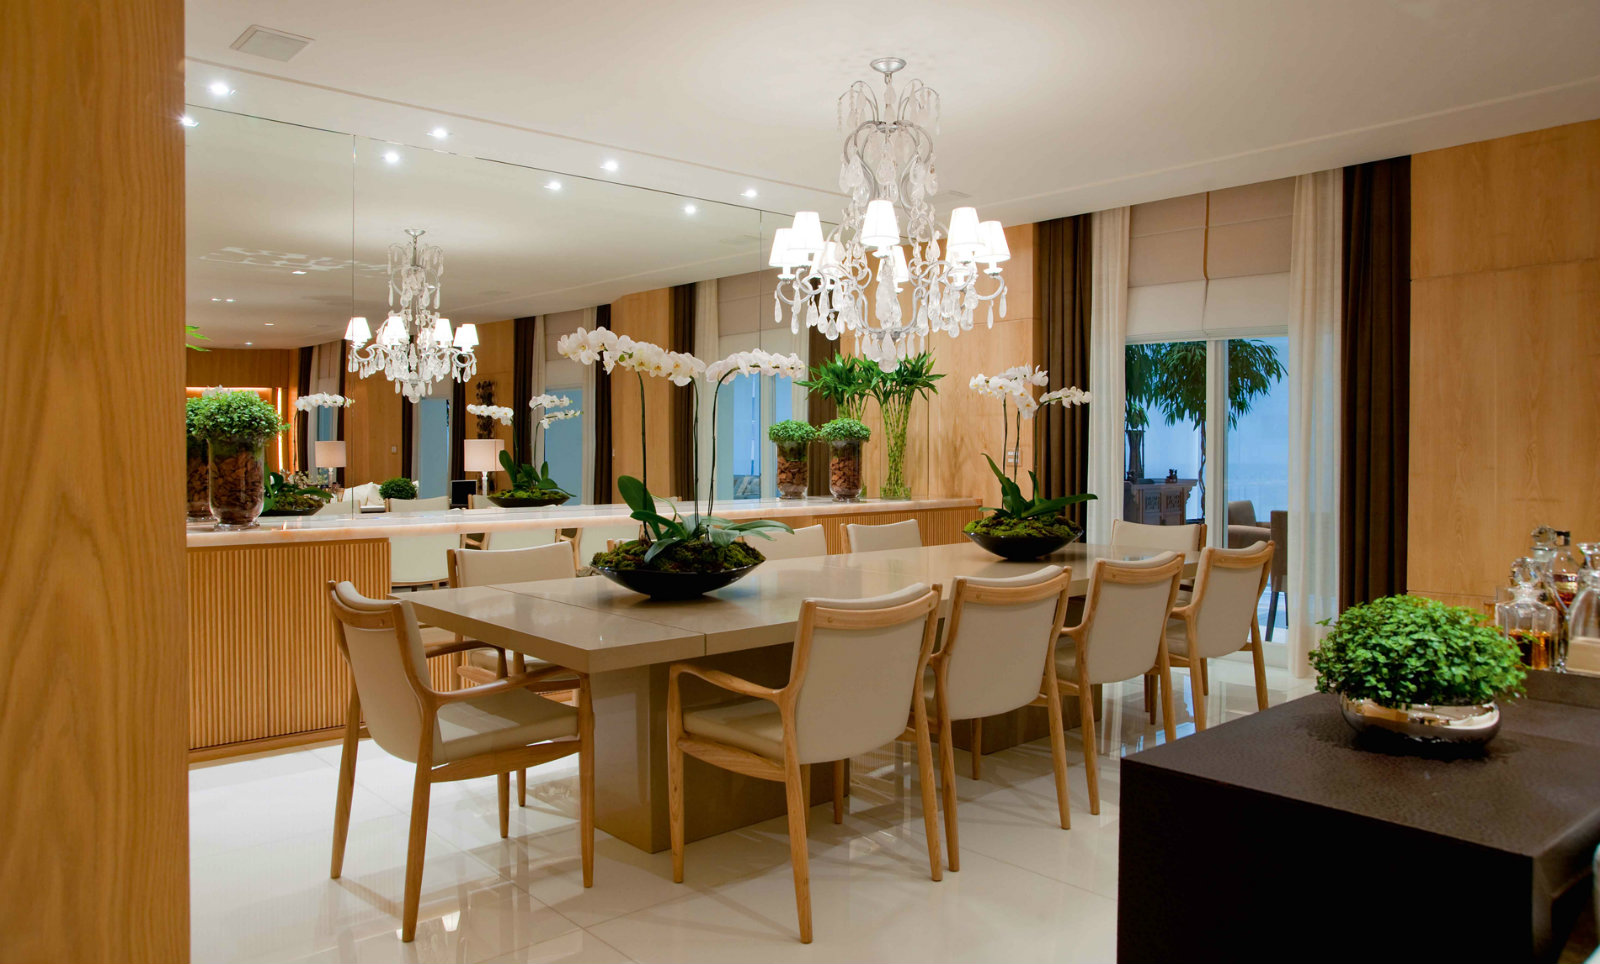 decorando-sala-de-jantar